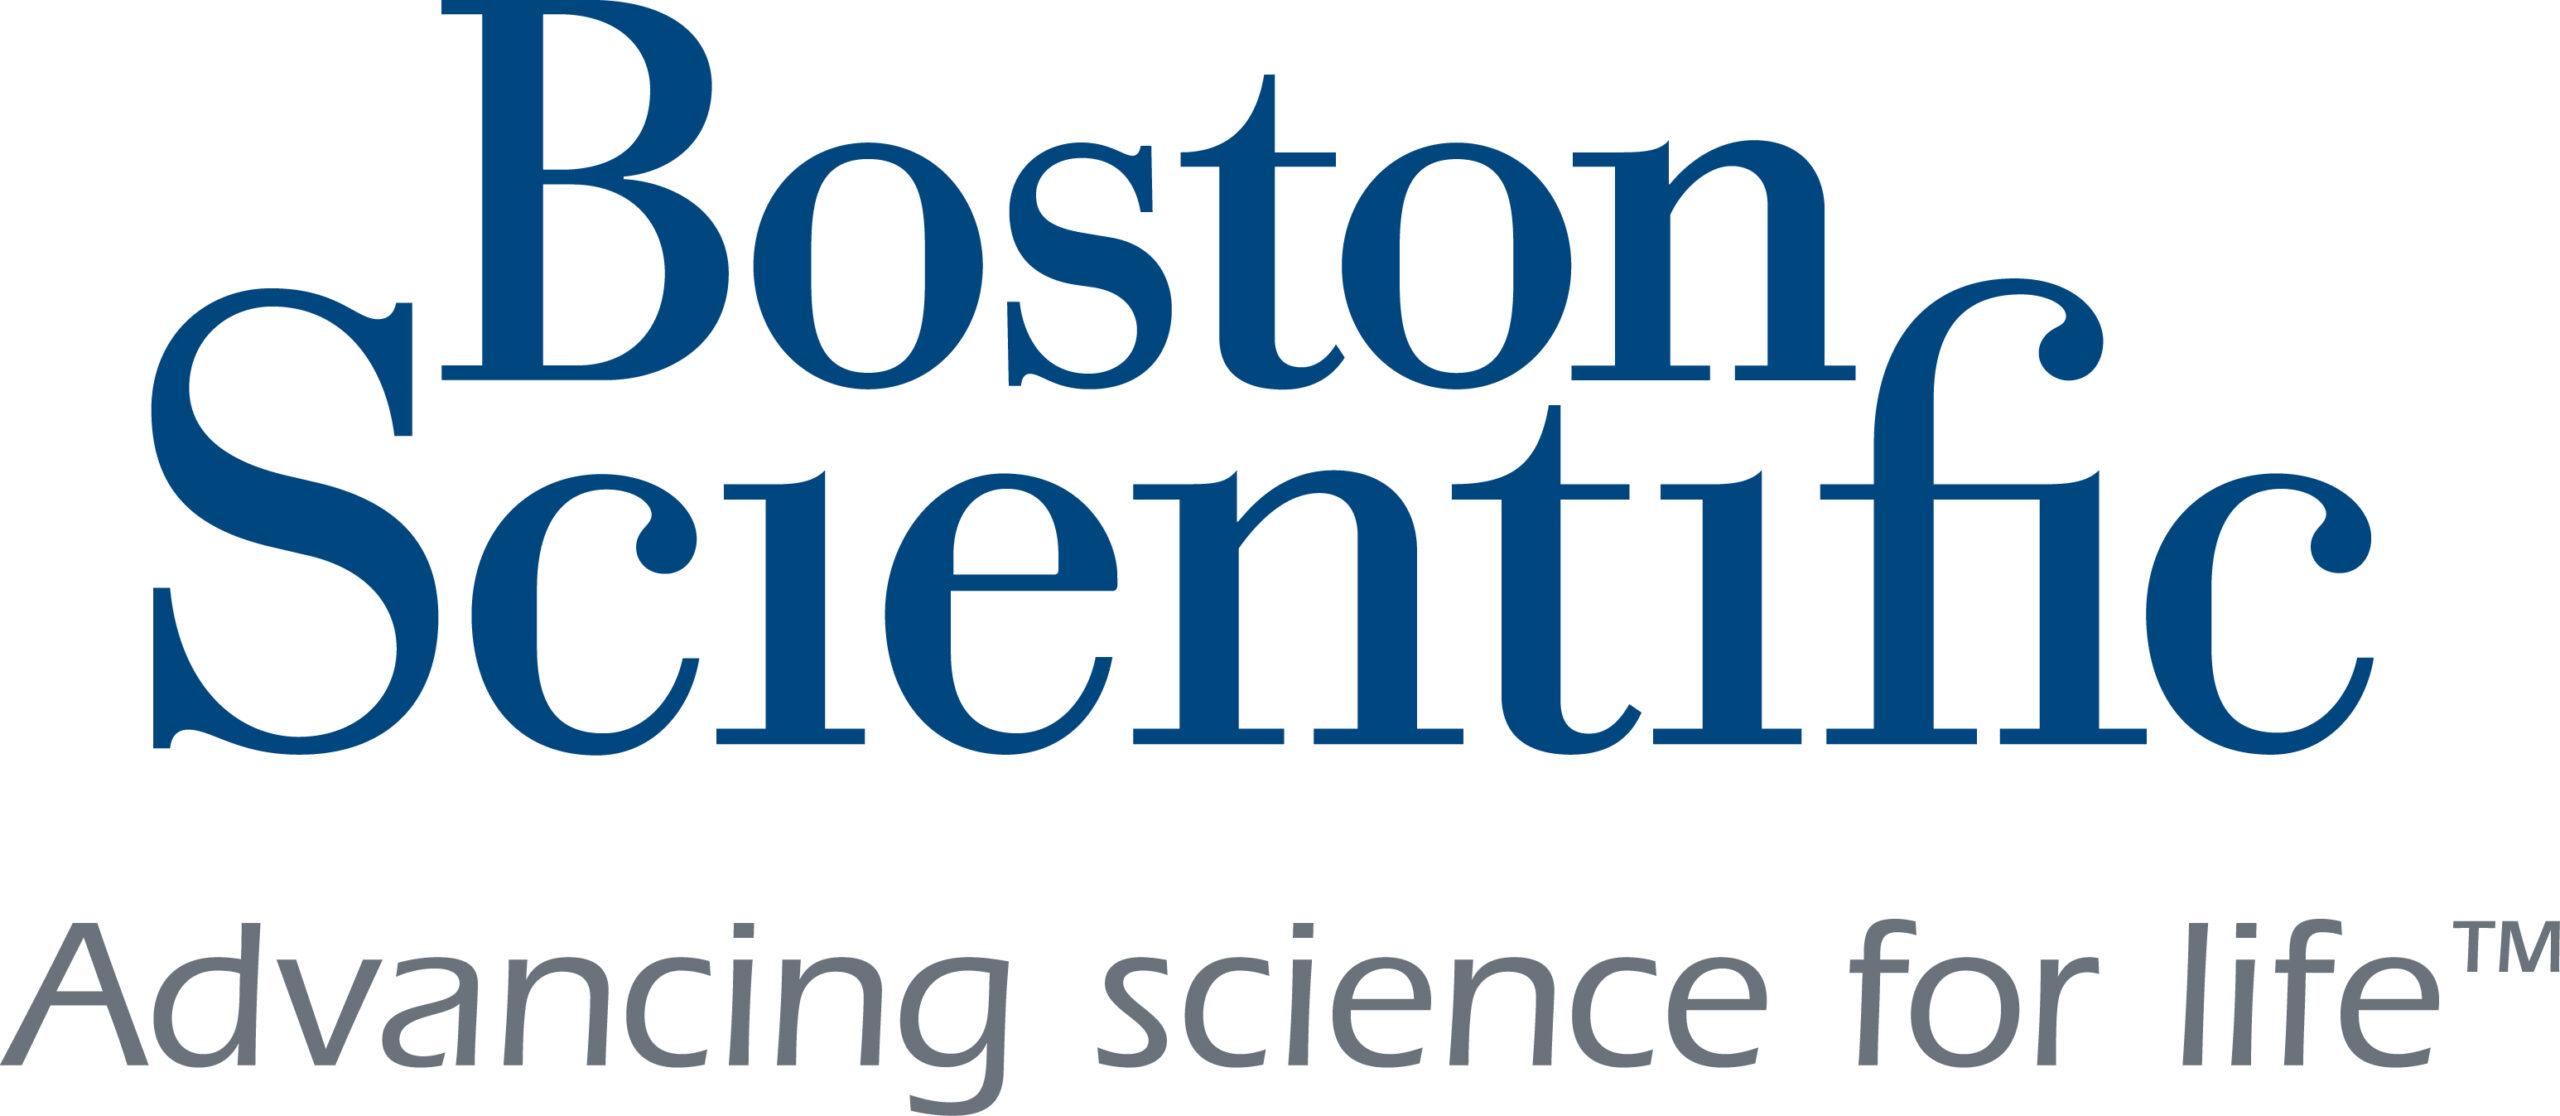 Boston Scientific To Exhibit At Jobs Expo Cork, 2015